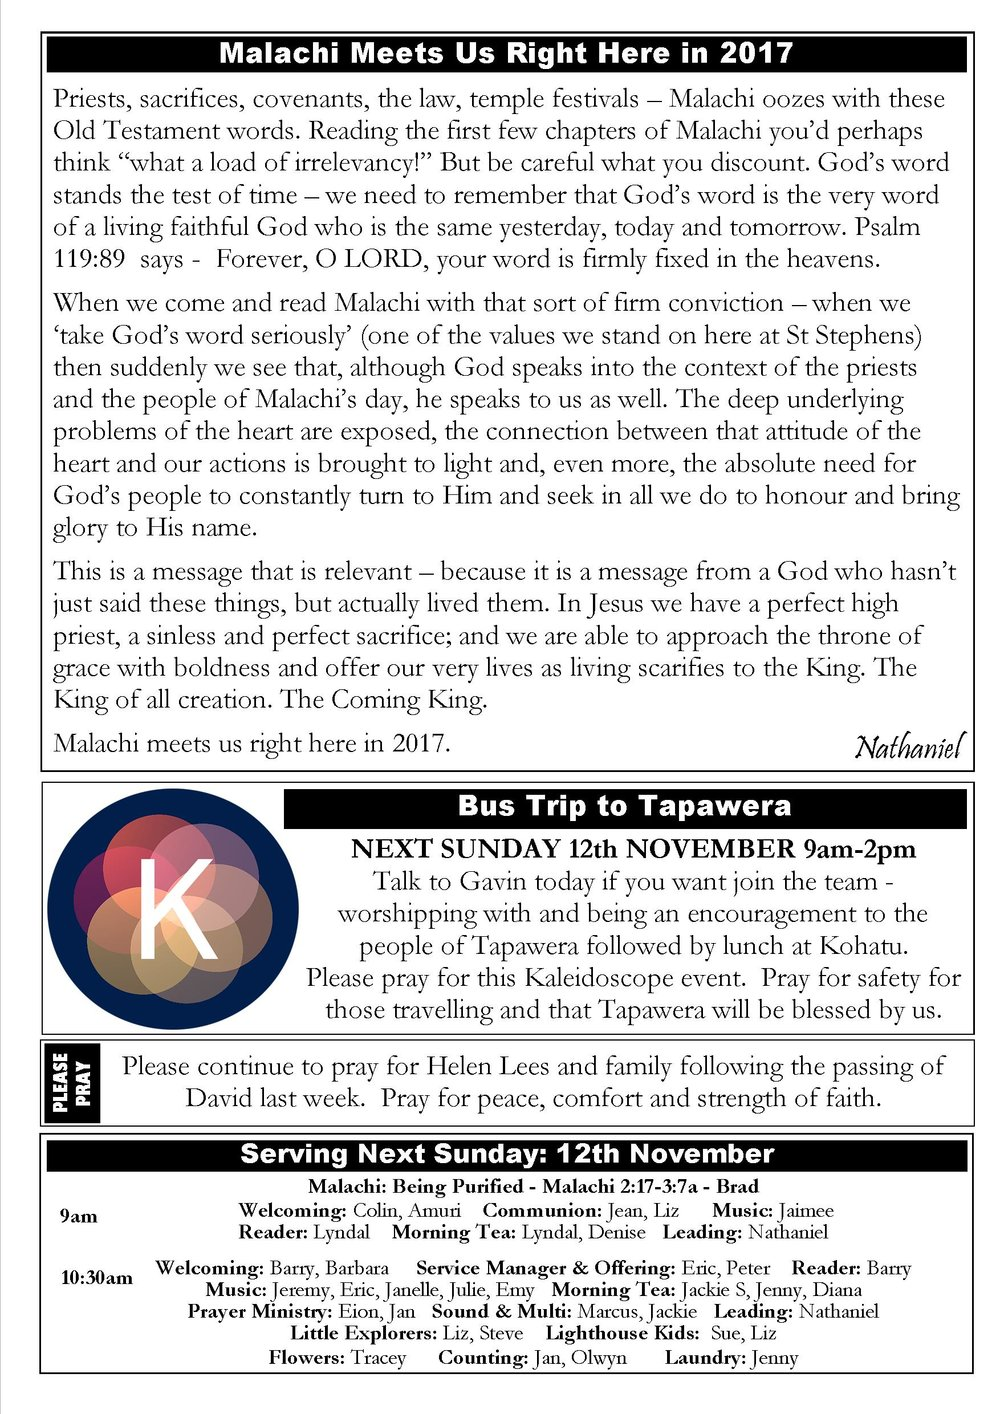 5th November page 2.jpg